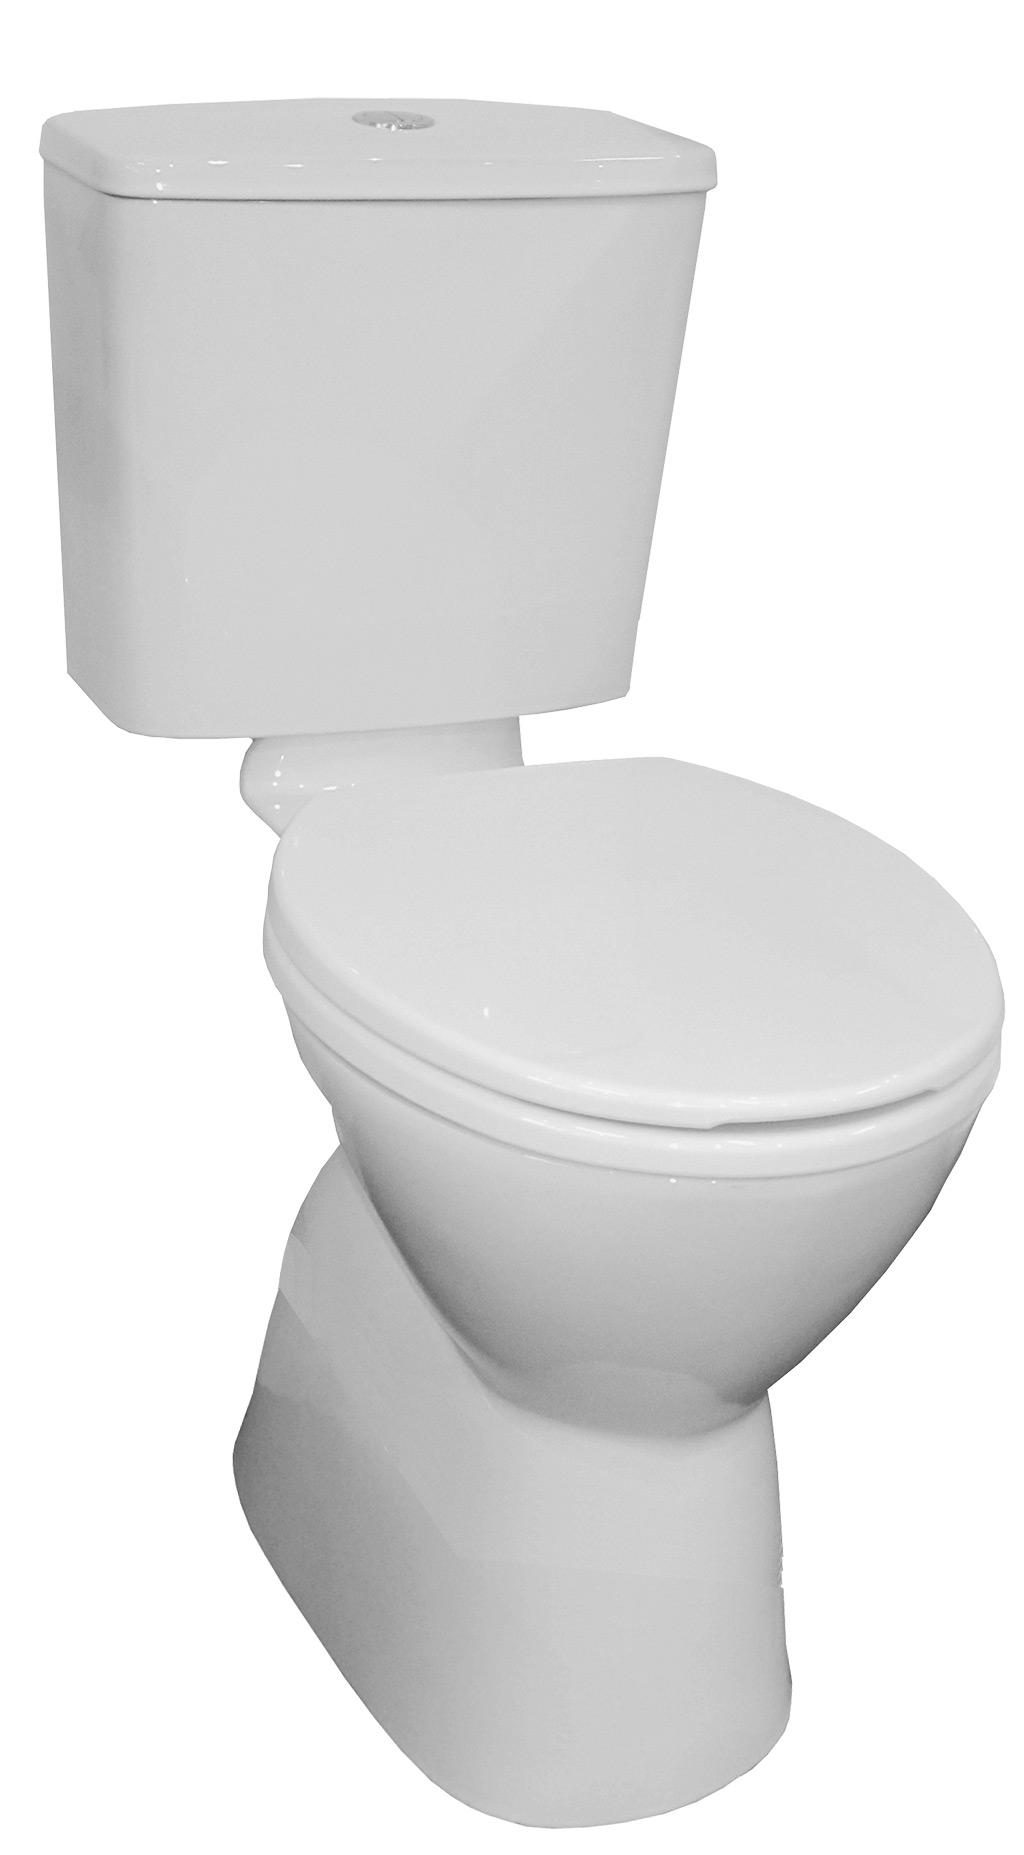 Plaza Deluxe VC Ambulant » Ambulant, Ambulant Toilets, Bronze ...